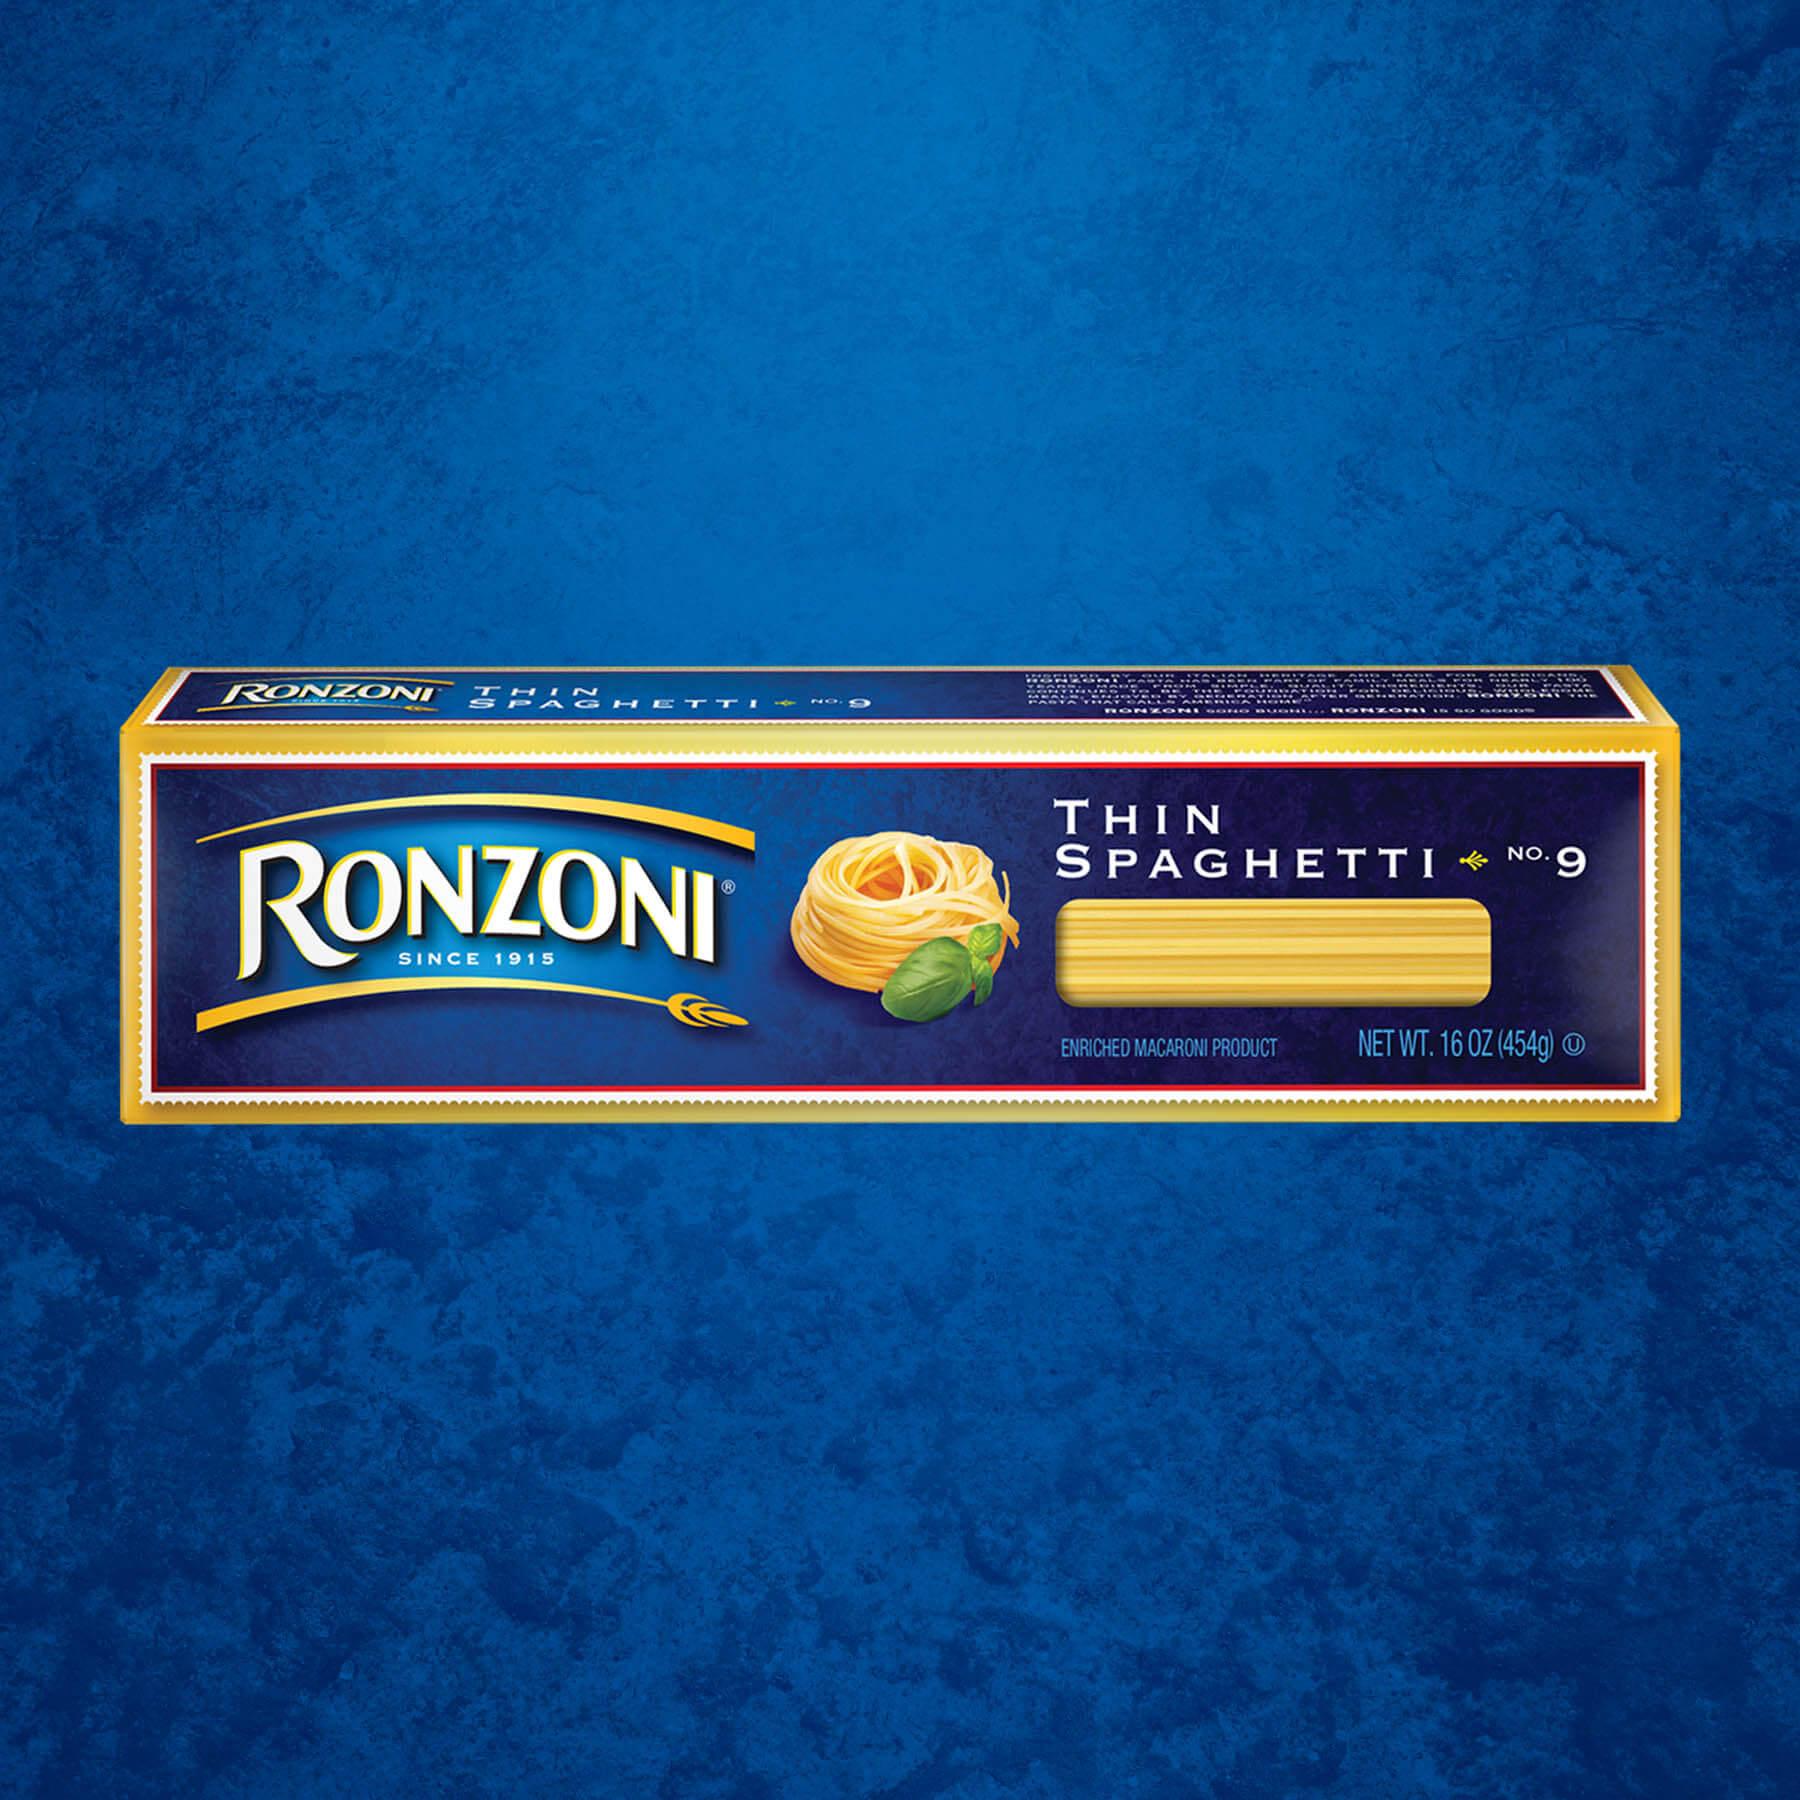 Ronzoni Spaghetti Package Design